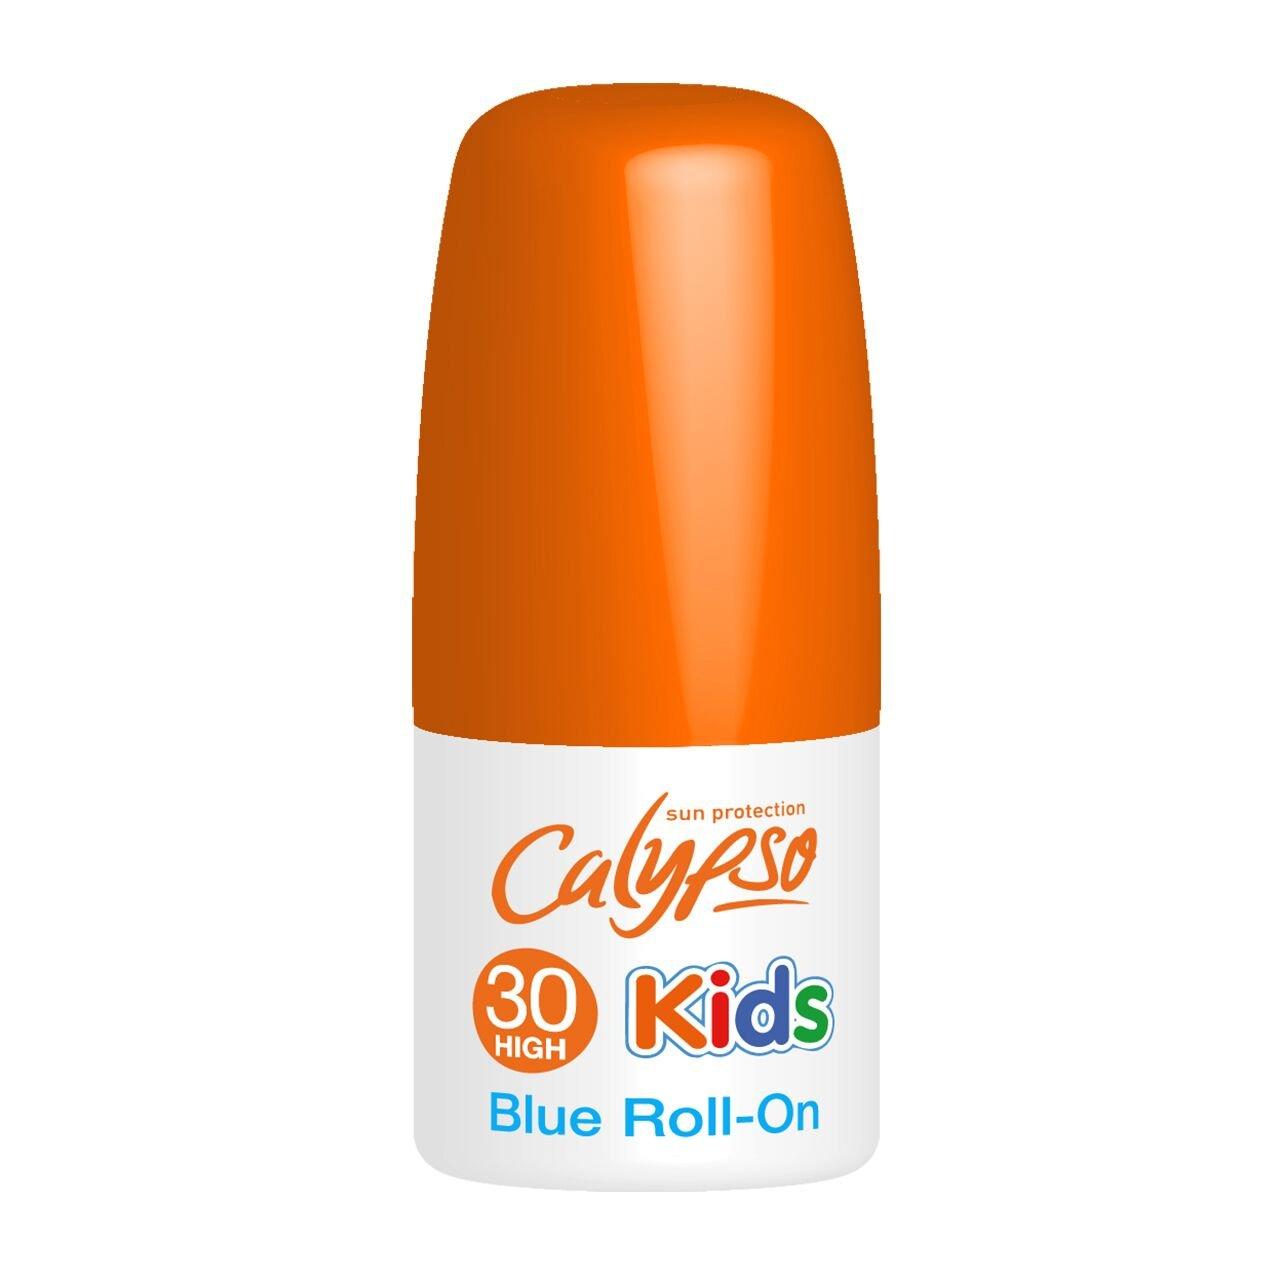 Calypso SPF 30 Colour Changing Kids Roll-On, 50 ml Linco Care CYCAL30CBR